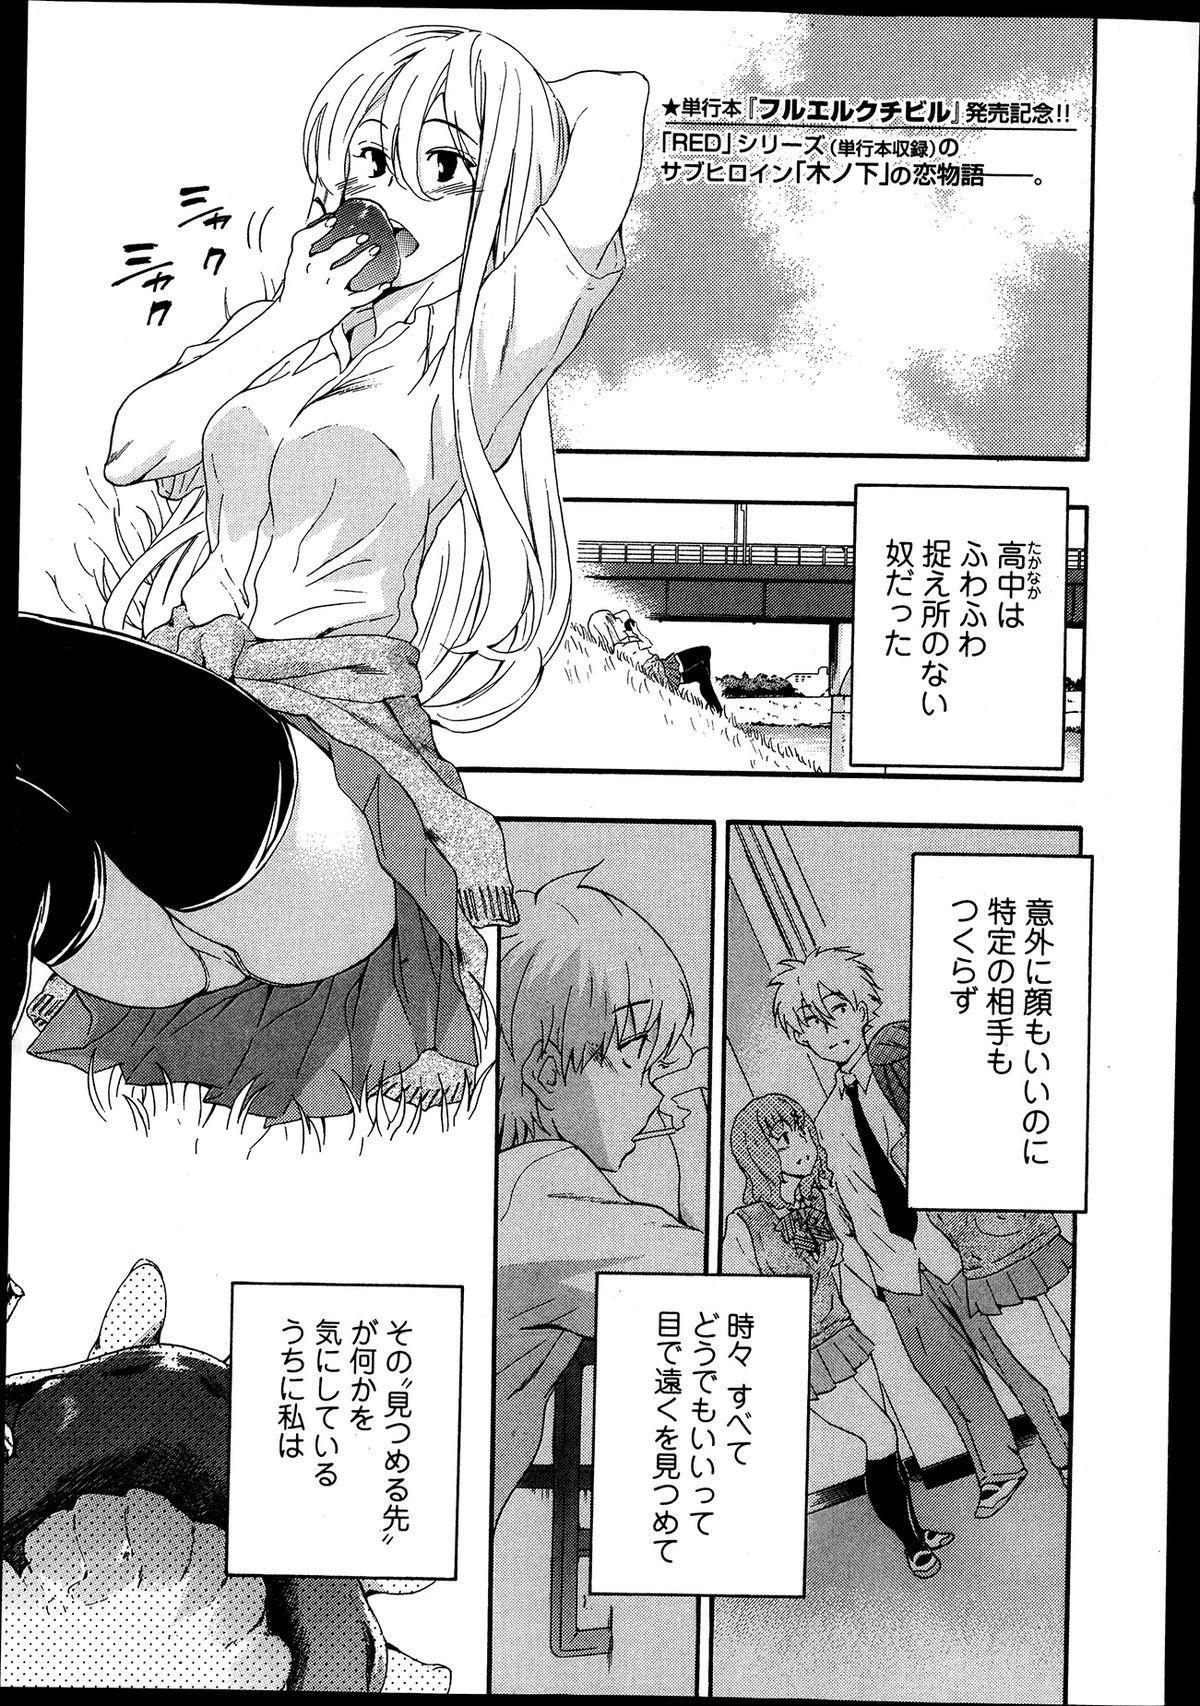 Bishoujo Kakumei KIWAME Road Vol.9 70